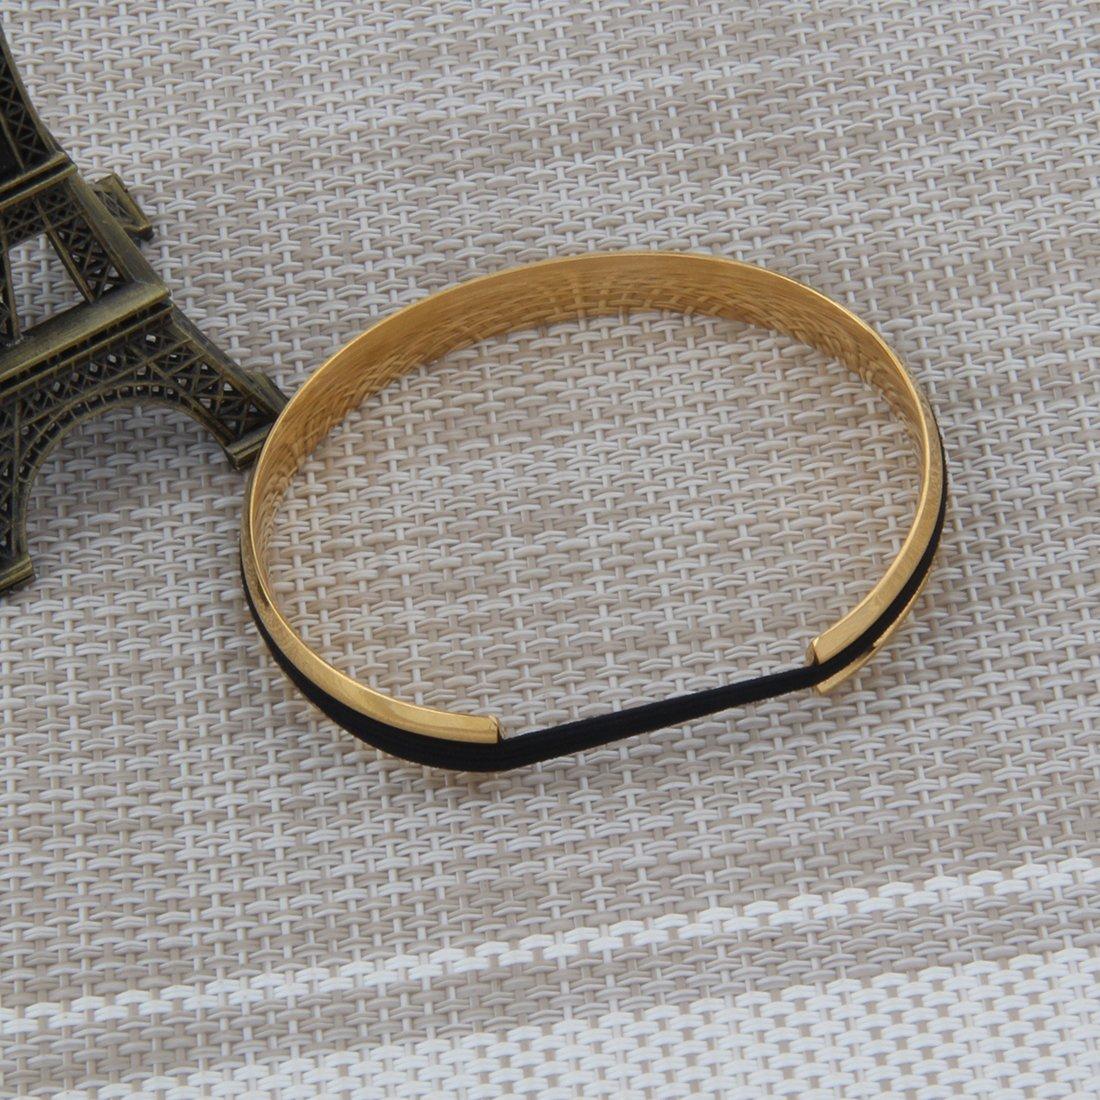 Zuo Bao Steel Bracelet V Groove Cuff Bangle